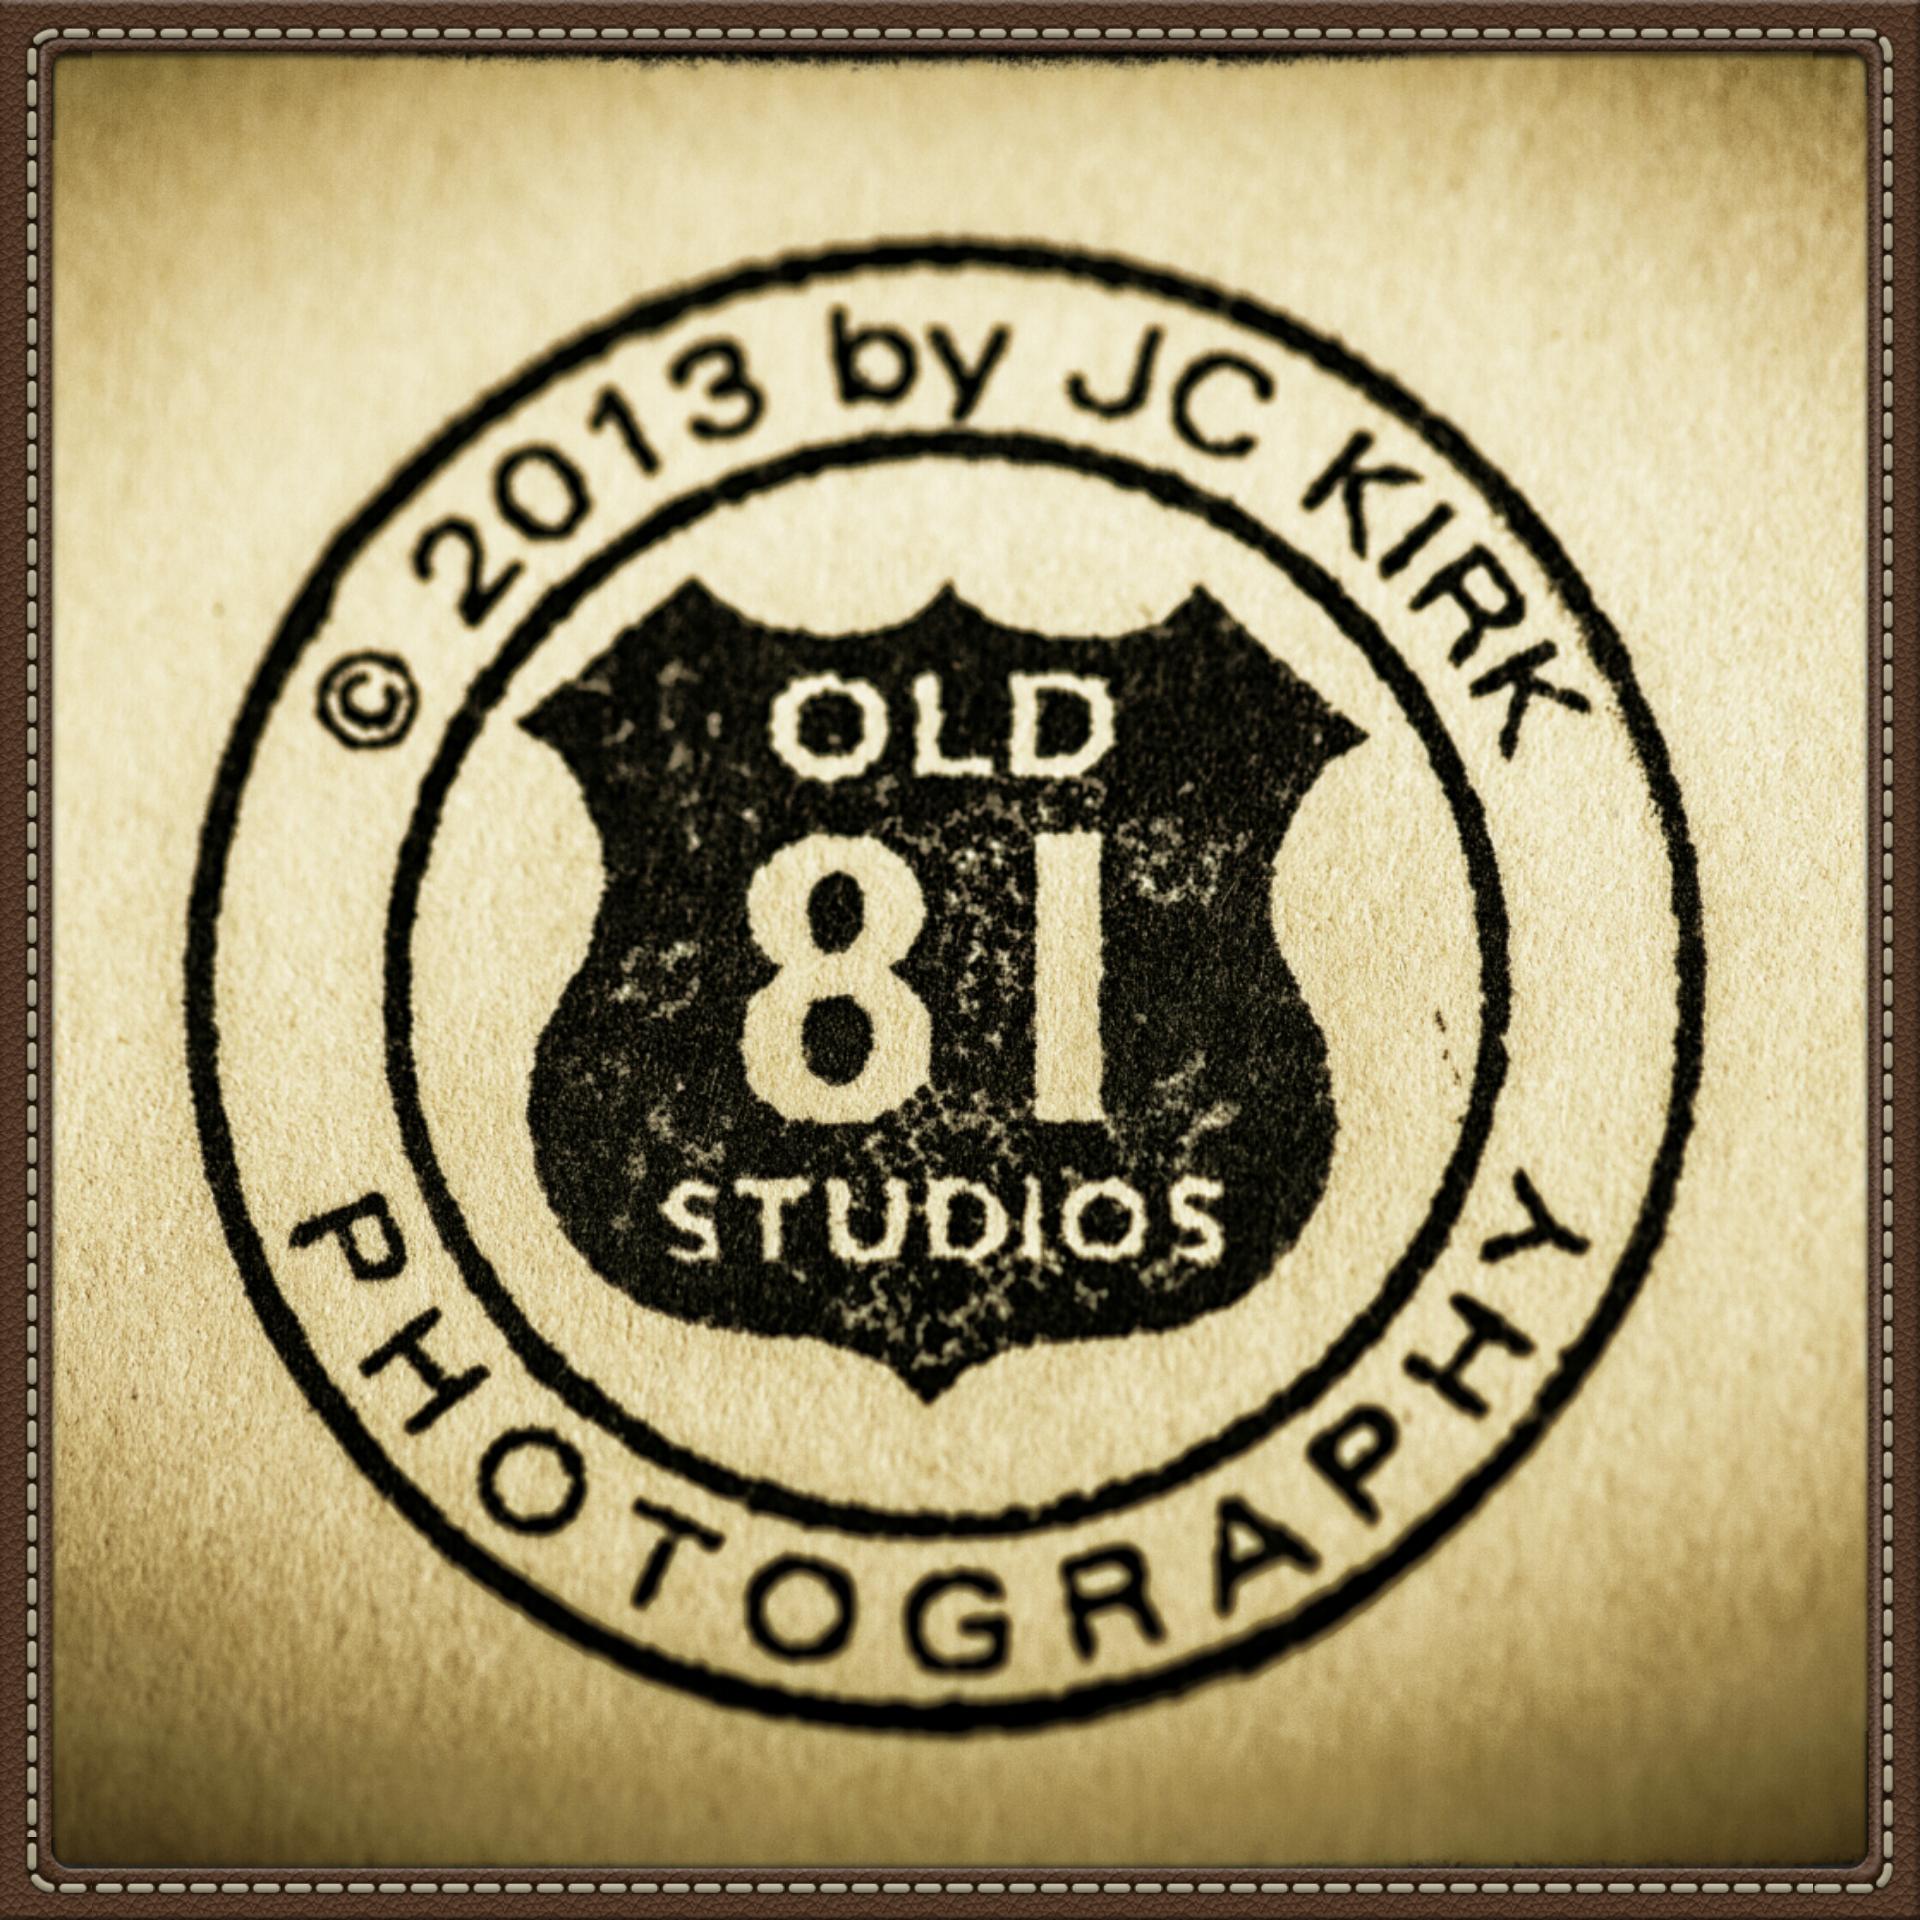 OLD 81 STUDIOS